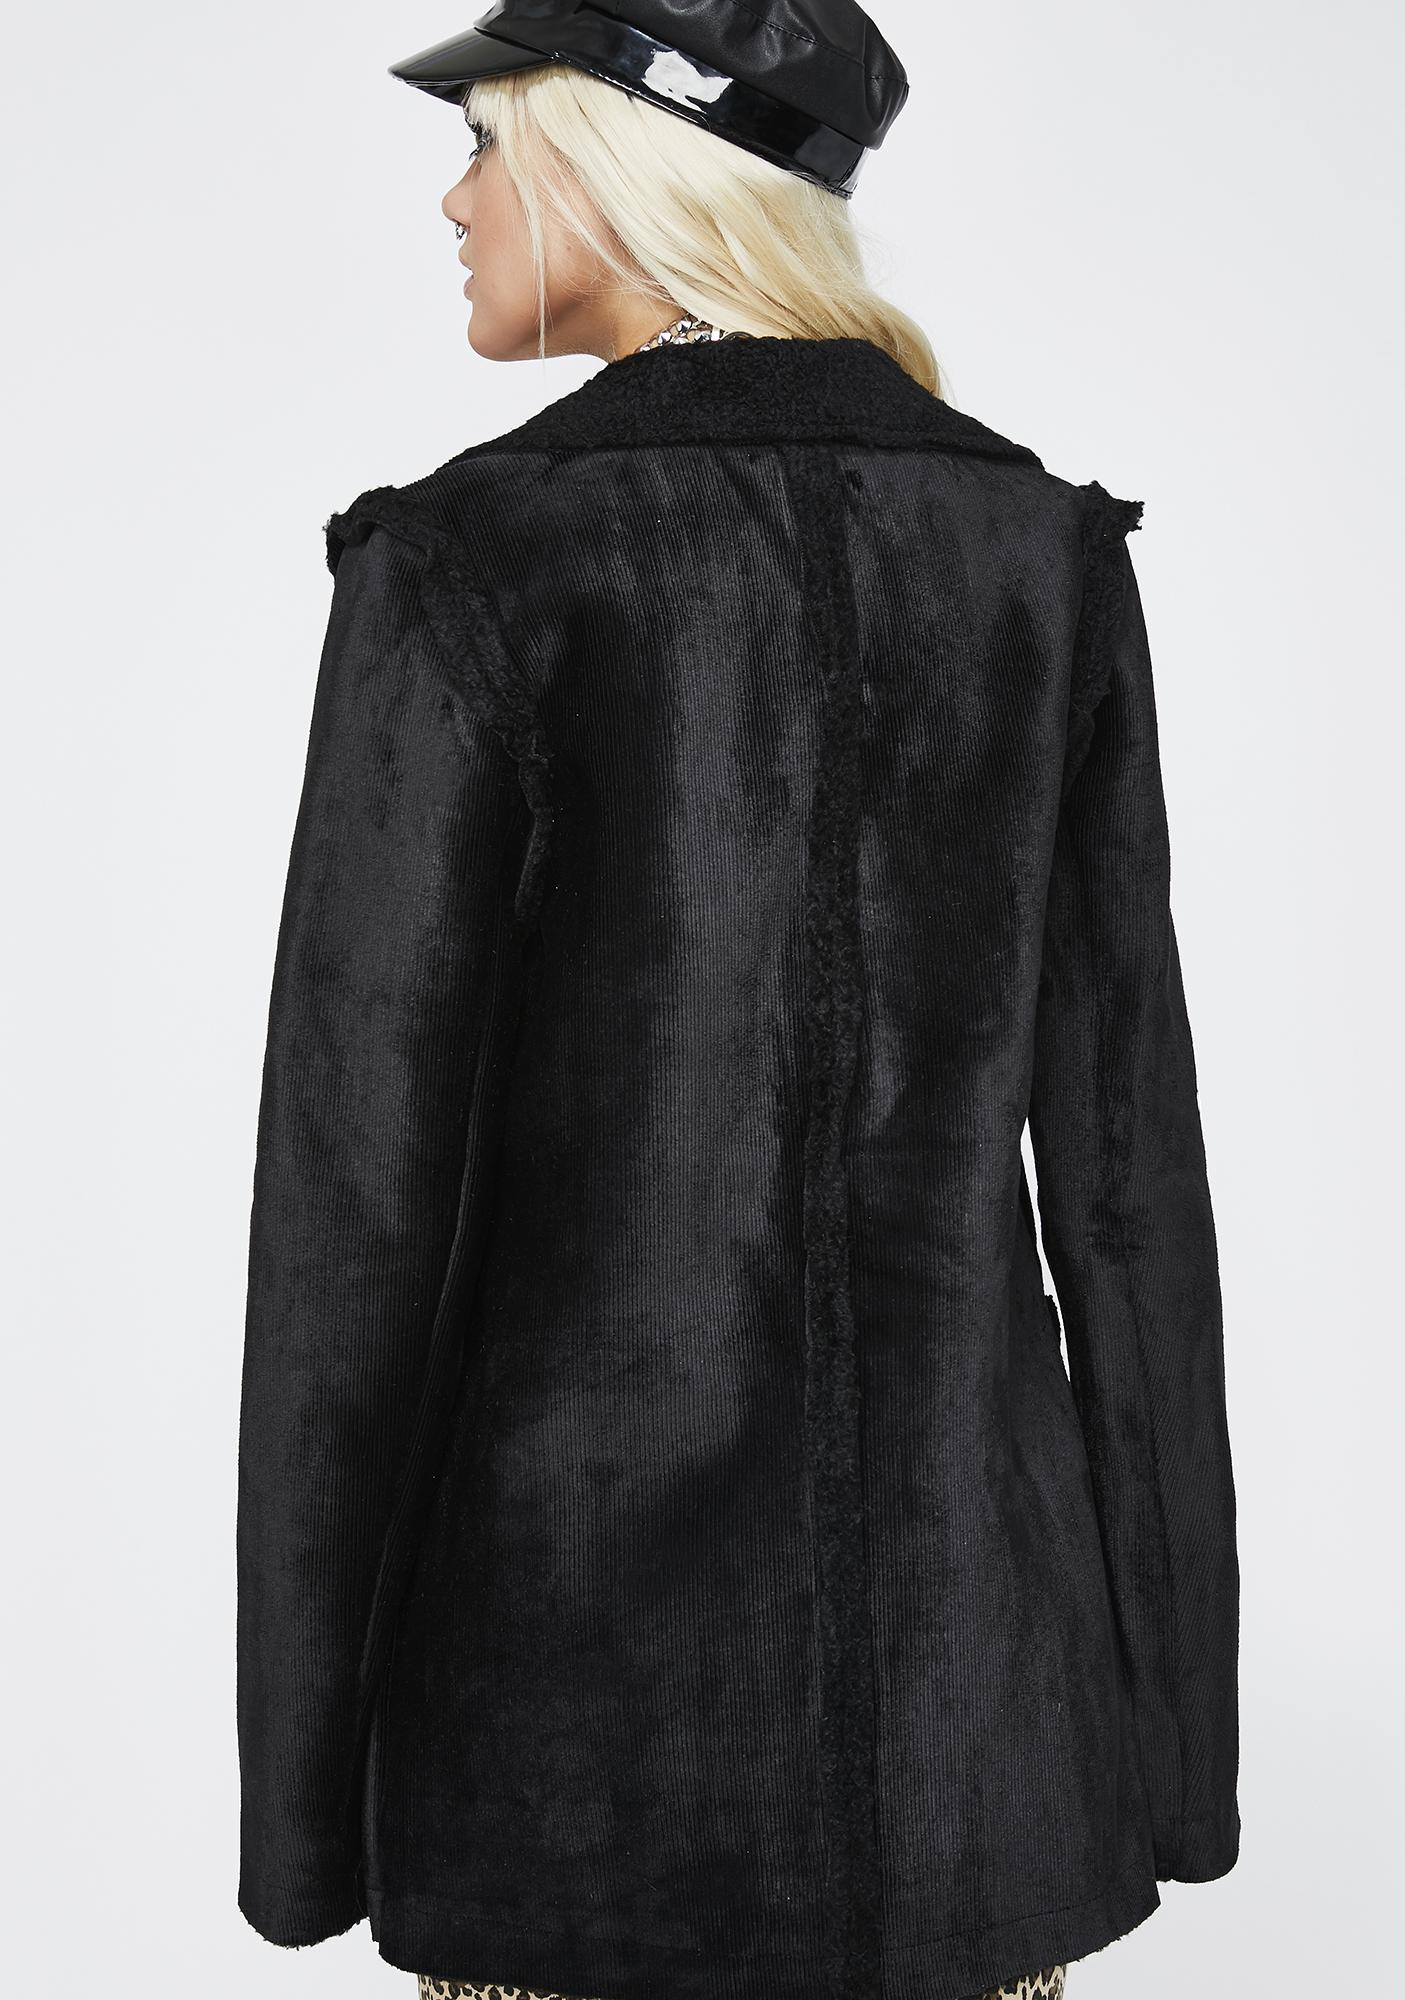 Onyx Spirit Weaver Sherpa Coat